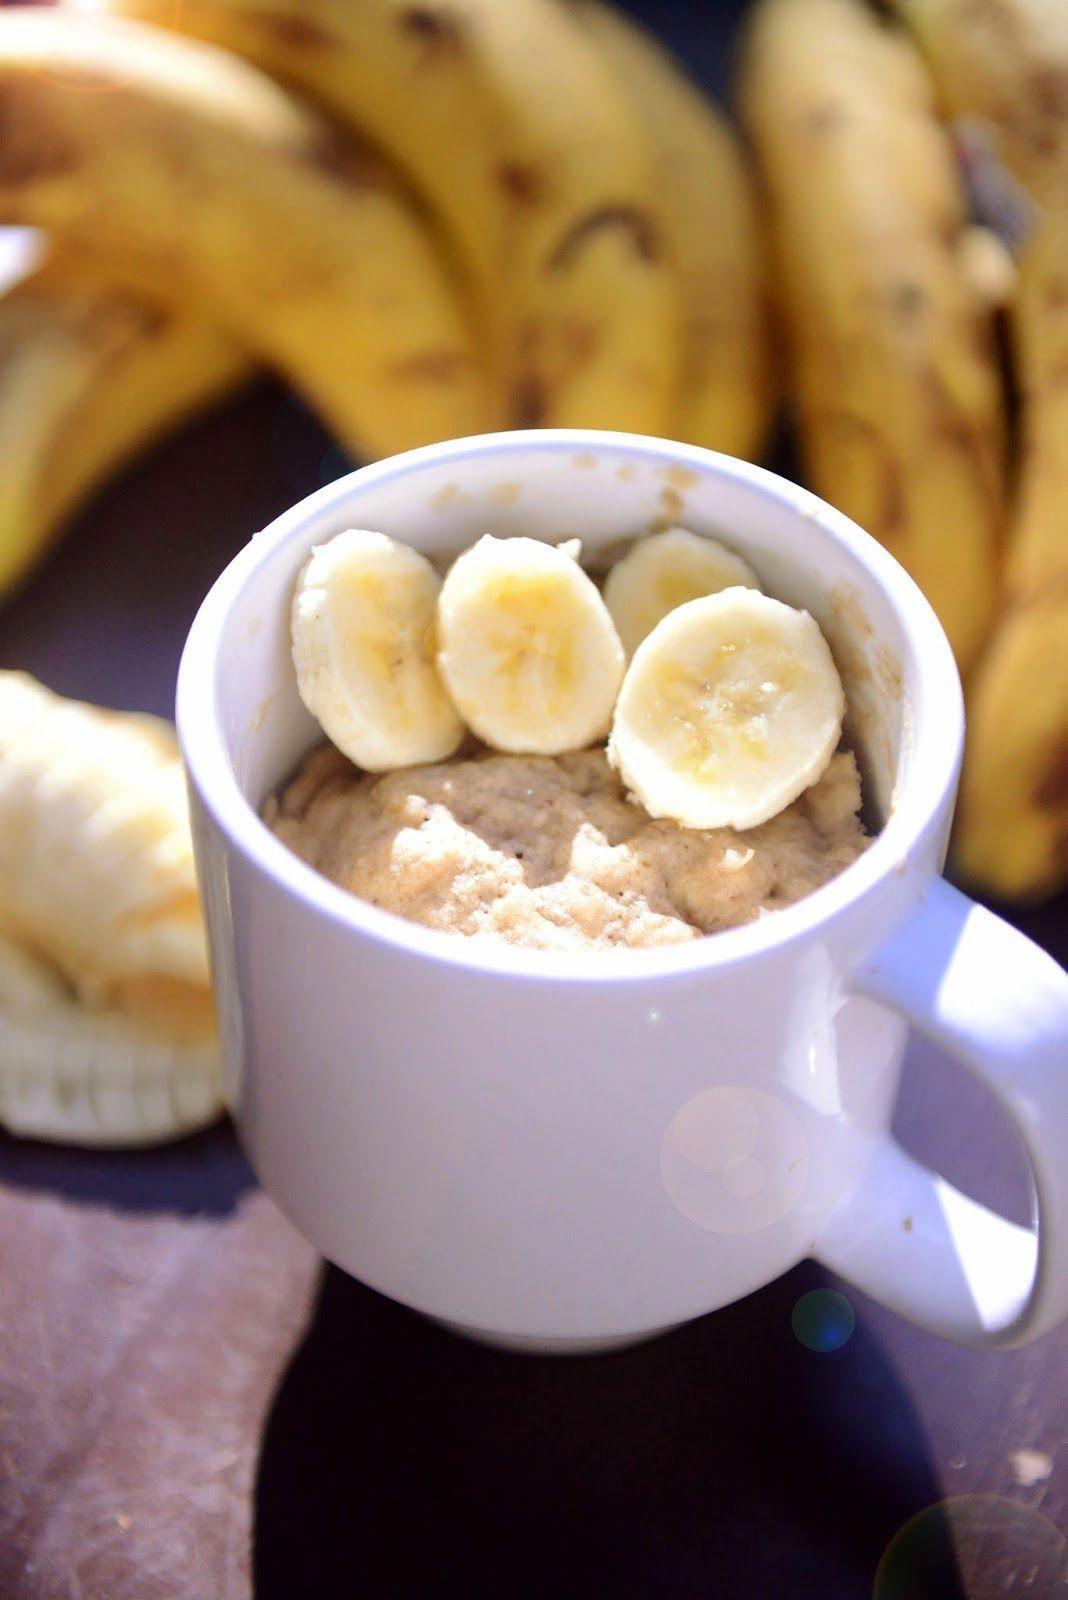 Eat Your Veggiez: 3-minute Banana Bread (no egg) in a Mug ...